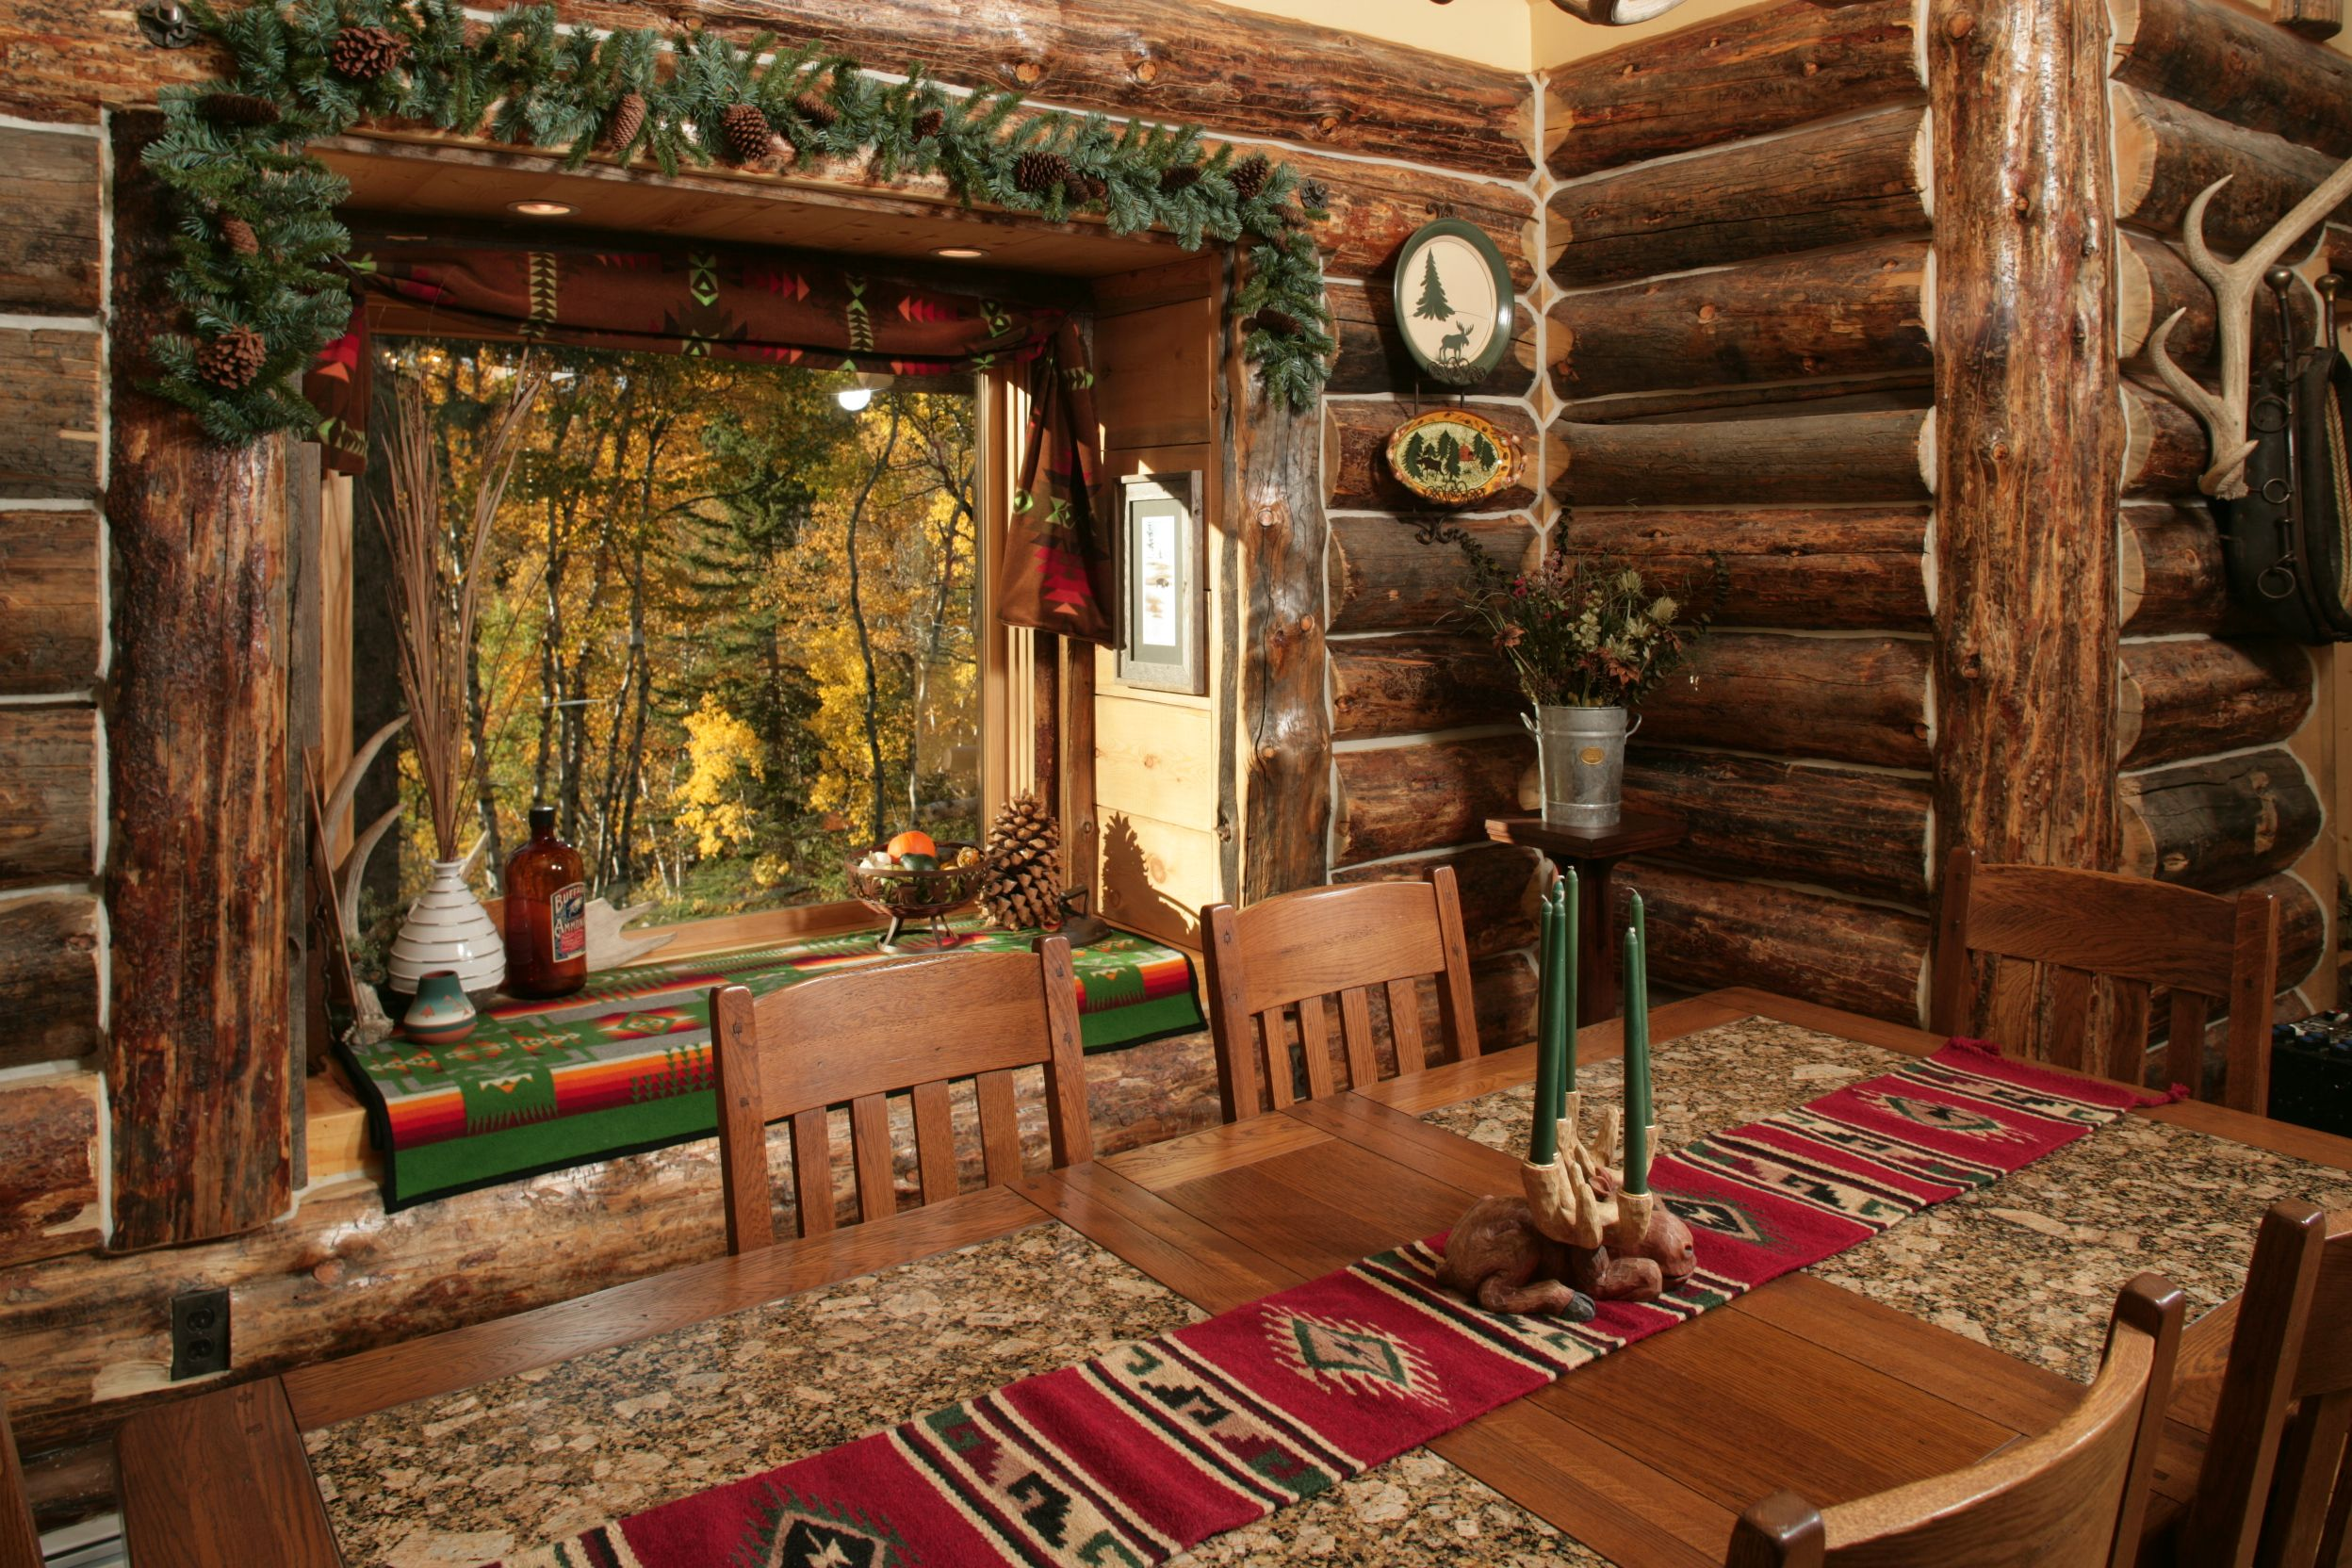 Log Cabin Interior Photo Gallery | ... Wood Works Inc. Acorn ...